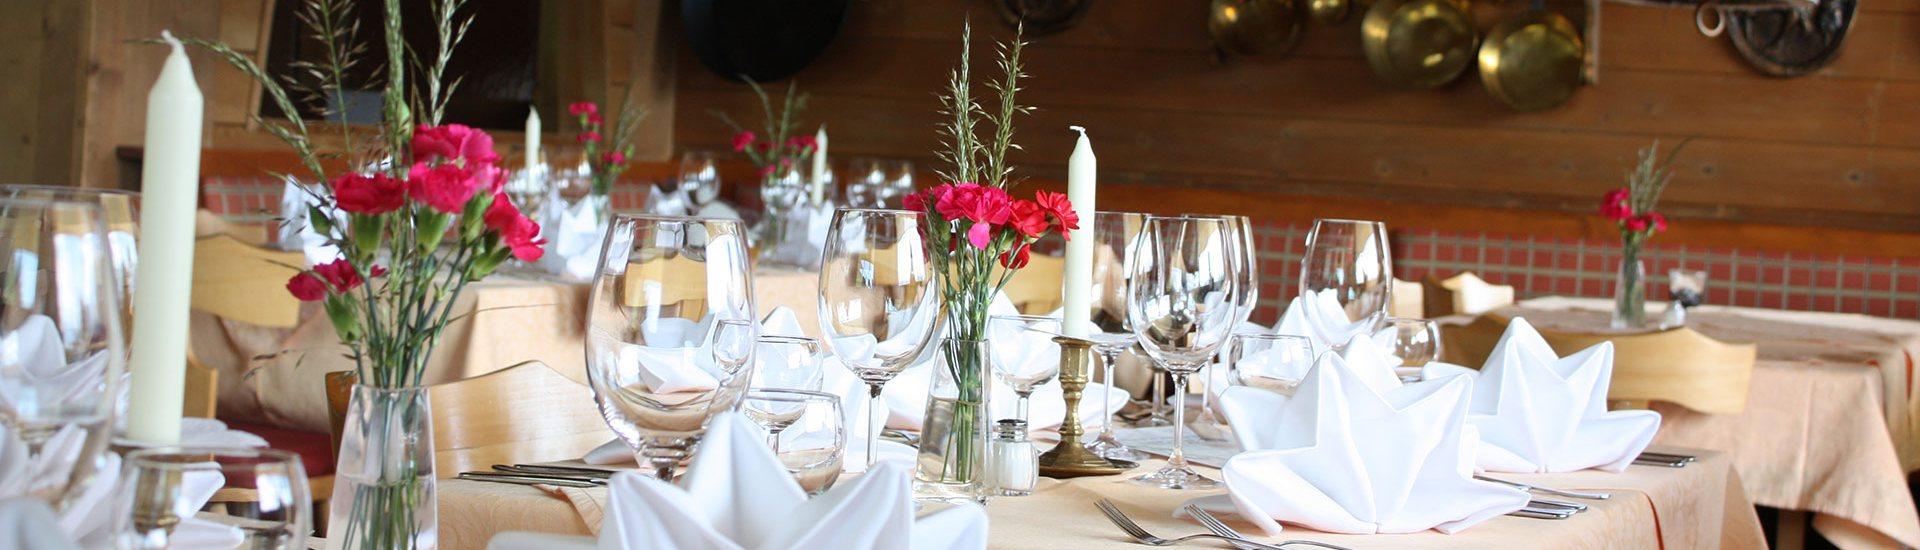 restaurant-hotel-bergerhof-5-s